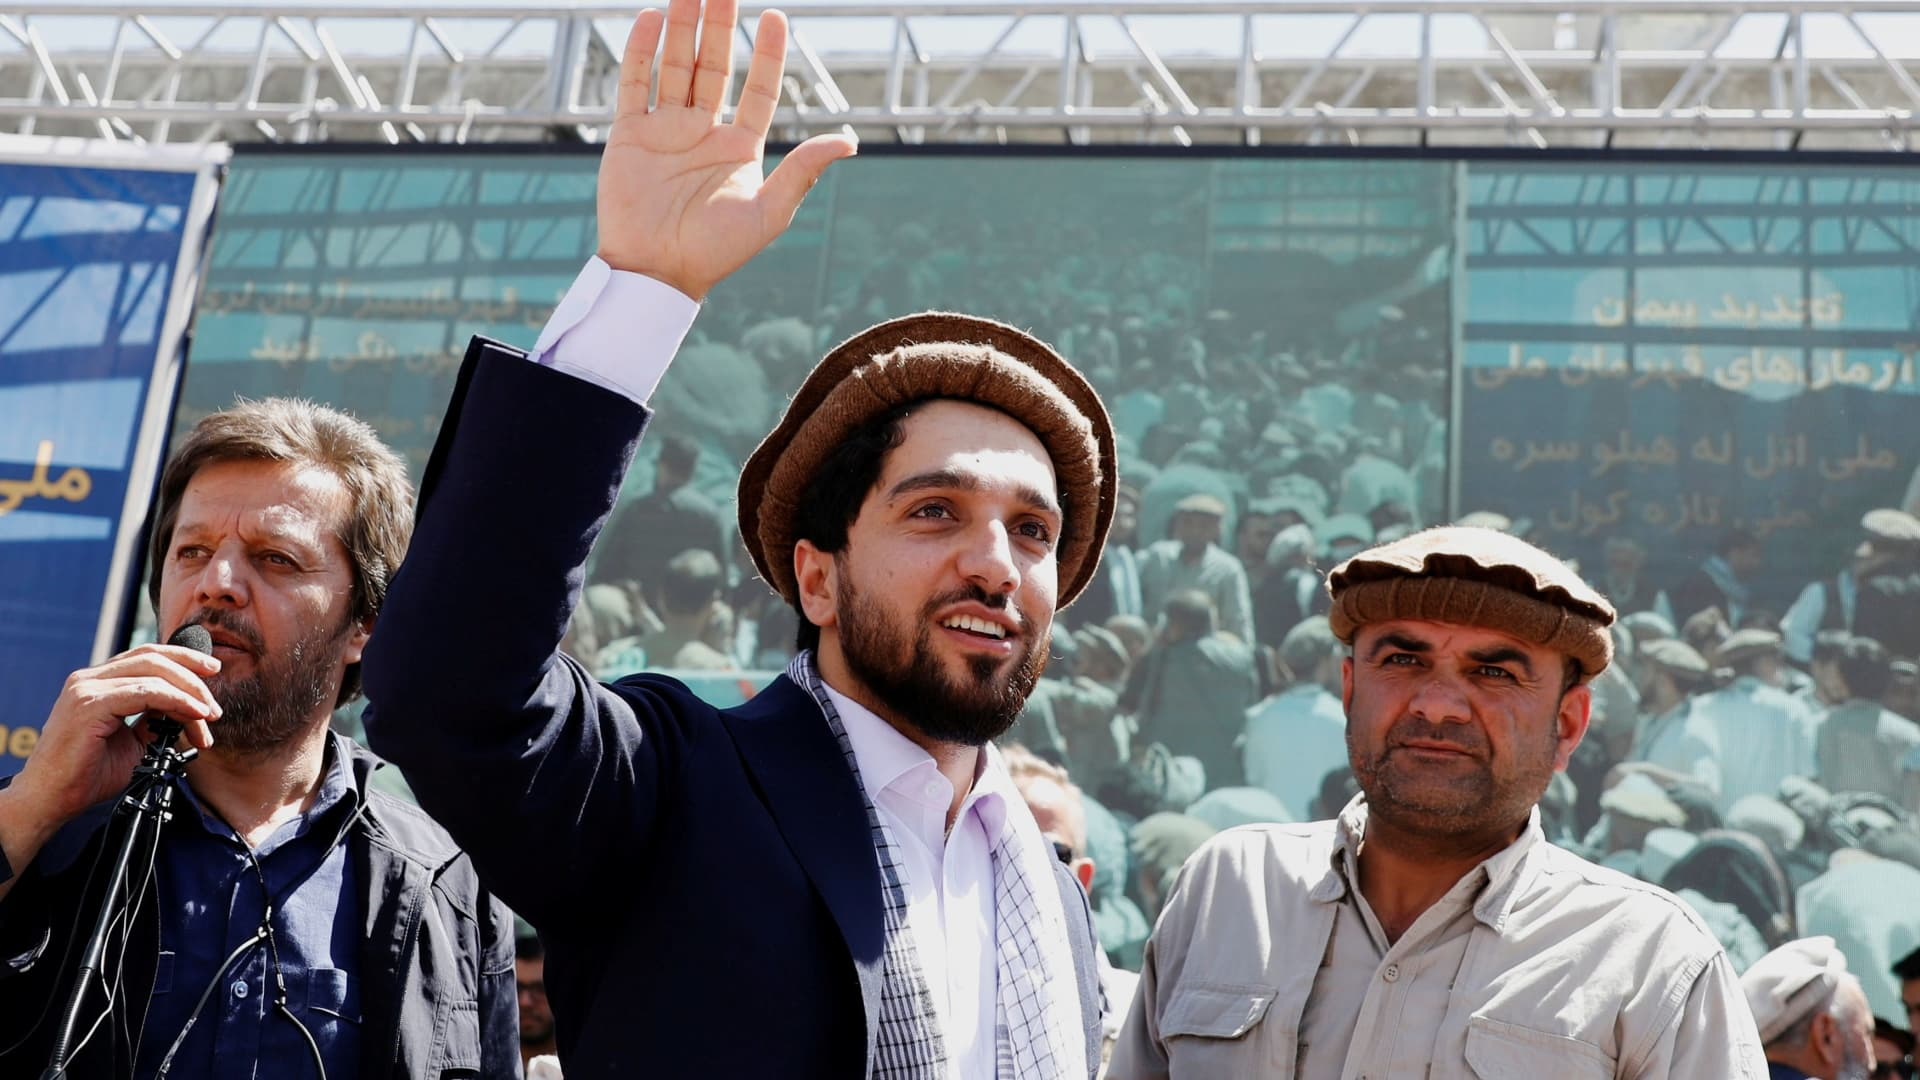 Ahmad Massoud, son of Afghanistan's slain anti-Soviet resistance hero Ahmad Shah Massoud, waves as he arrives to attend a gathering in Bazarak, Panjshir province, Afghanistan, September 5, 2019.